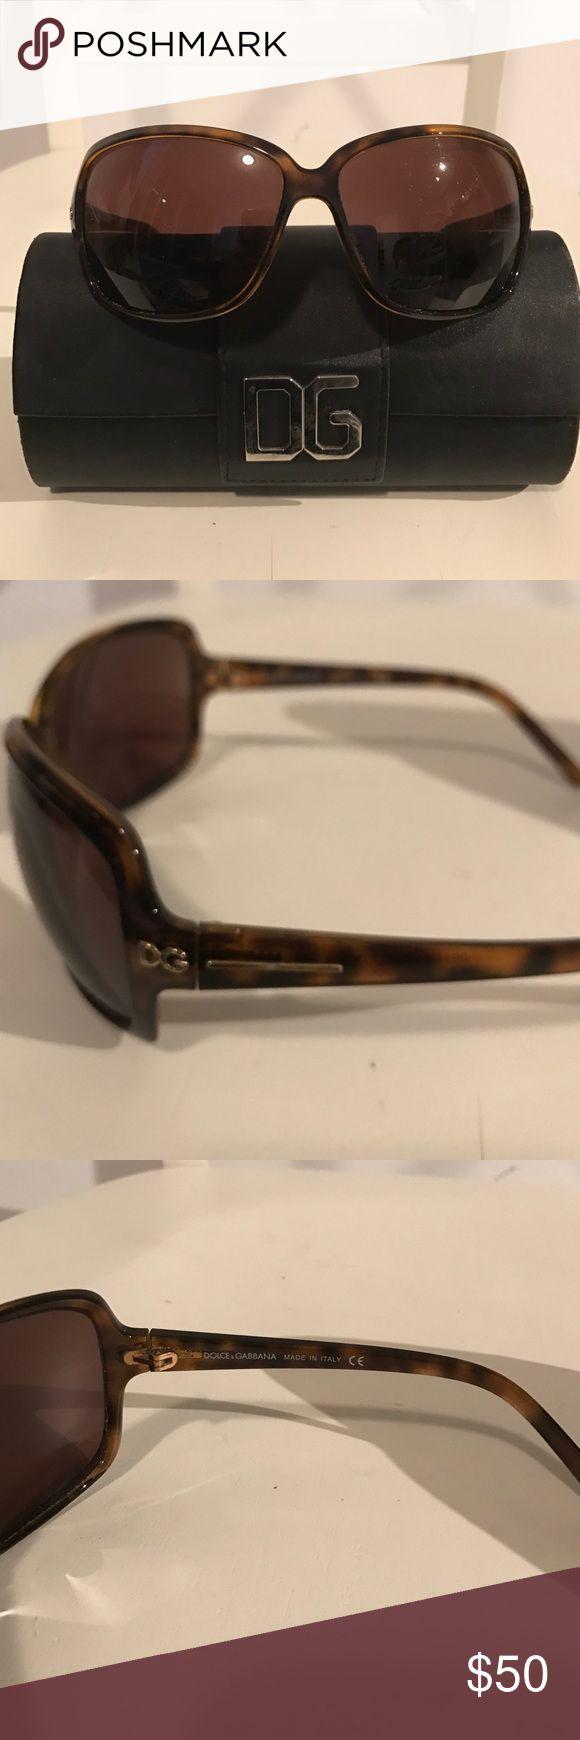 DOLCE & GABBANA:  brown tortoise sunglasses Brown classic tortoise shell dolce and gabbana sunglasses with original case! In amazing condition Dolce & Gabbana Accessories Sunglasses